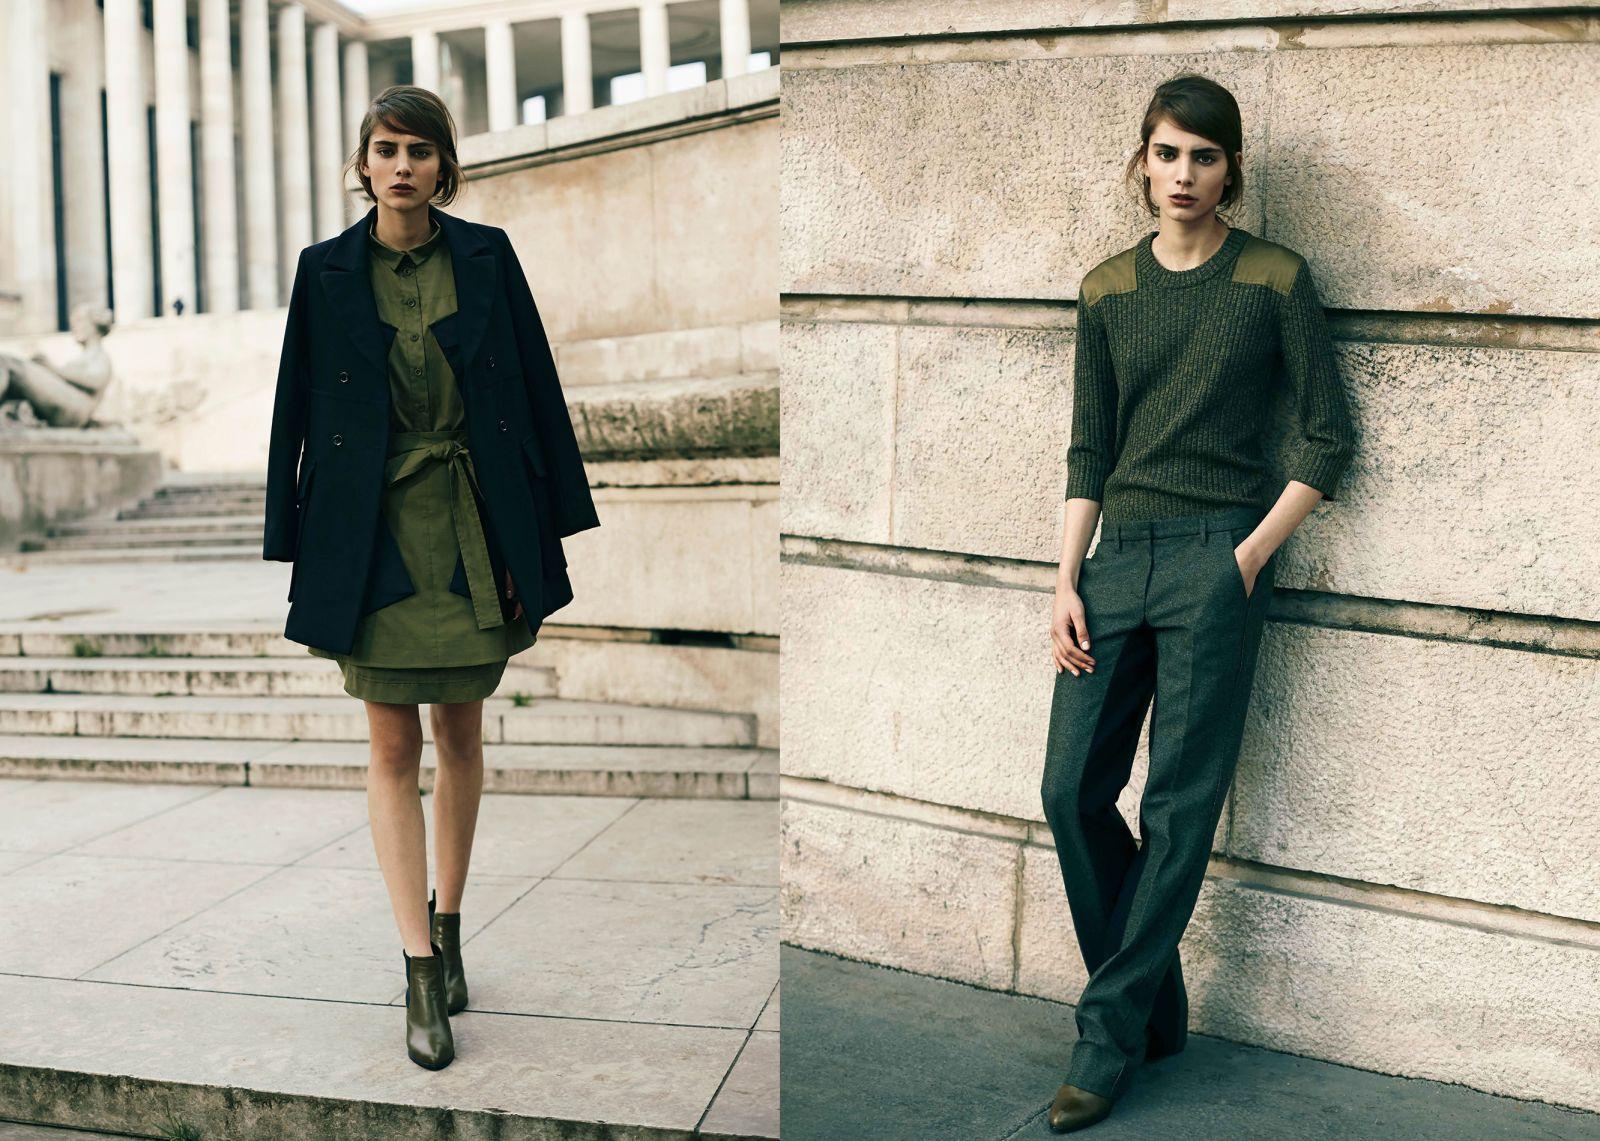 Что носить в 2015 году: тенденции pre-fall - фото №6